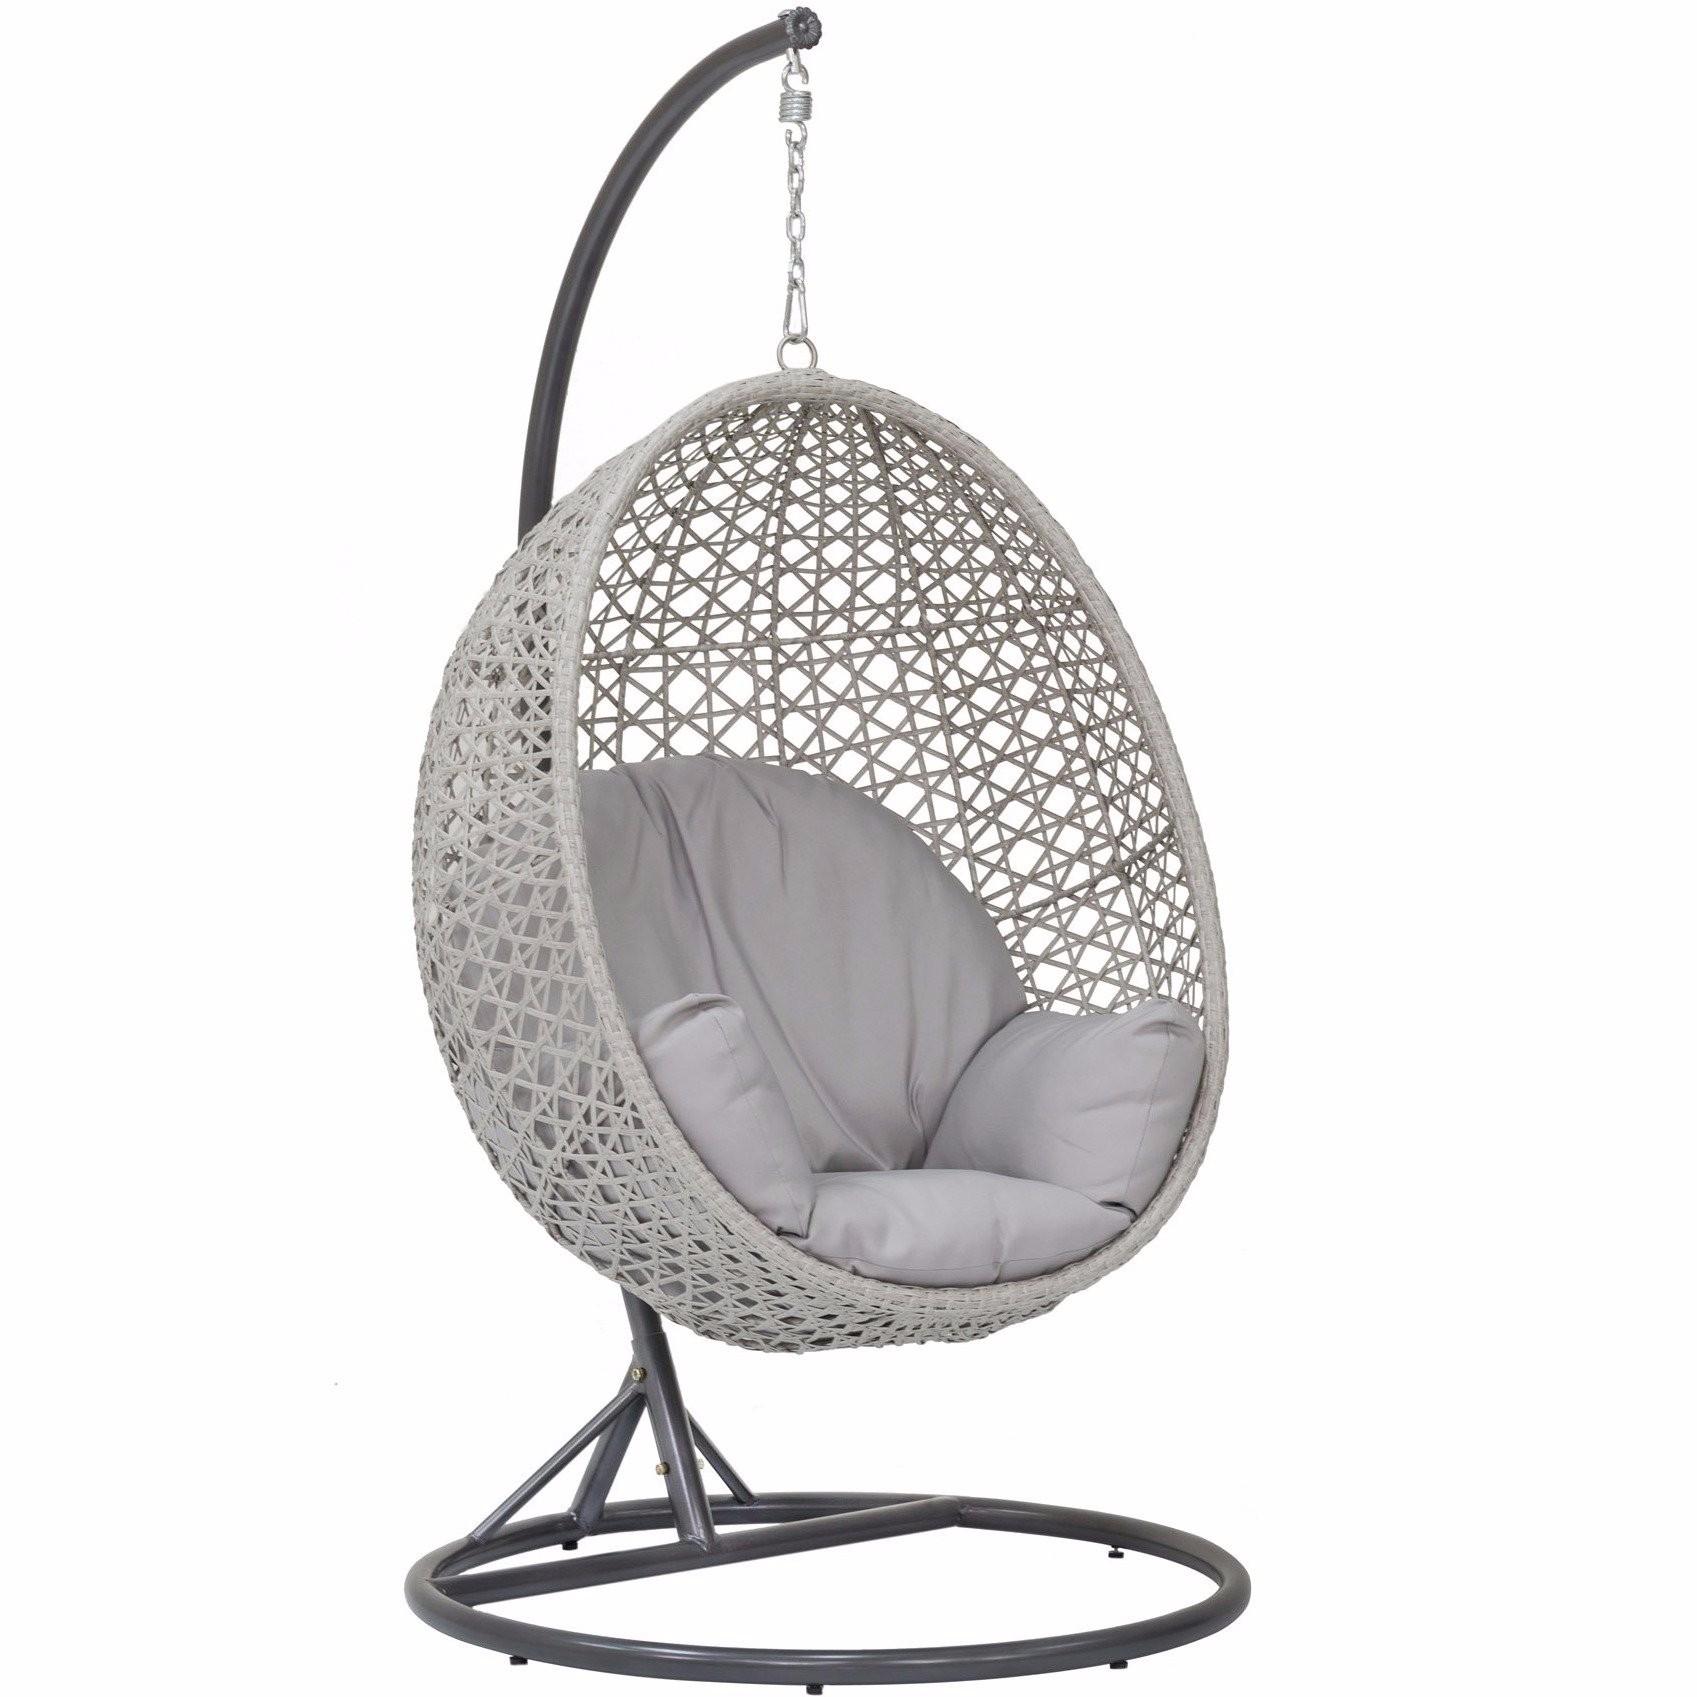 Rattan POD Hanging Egg Swing Chair